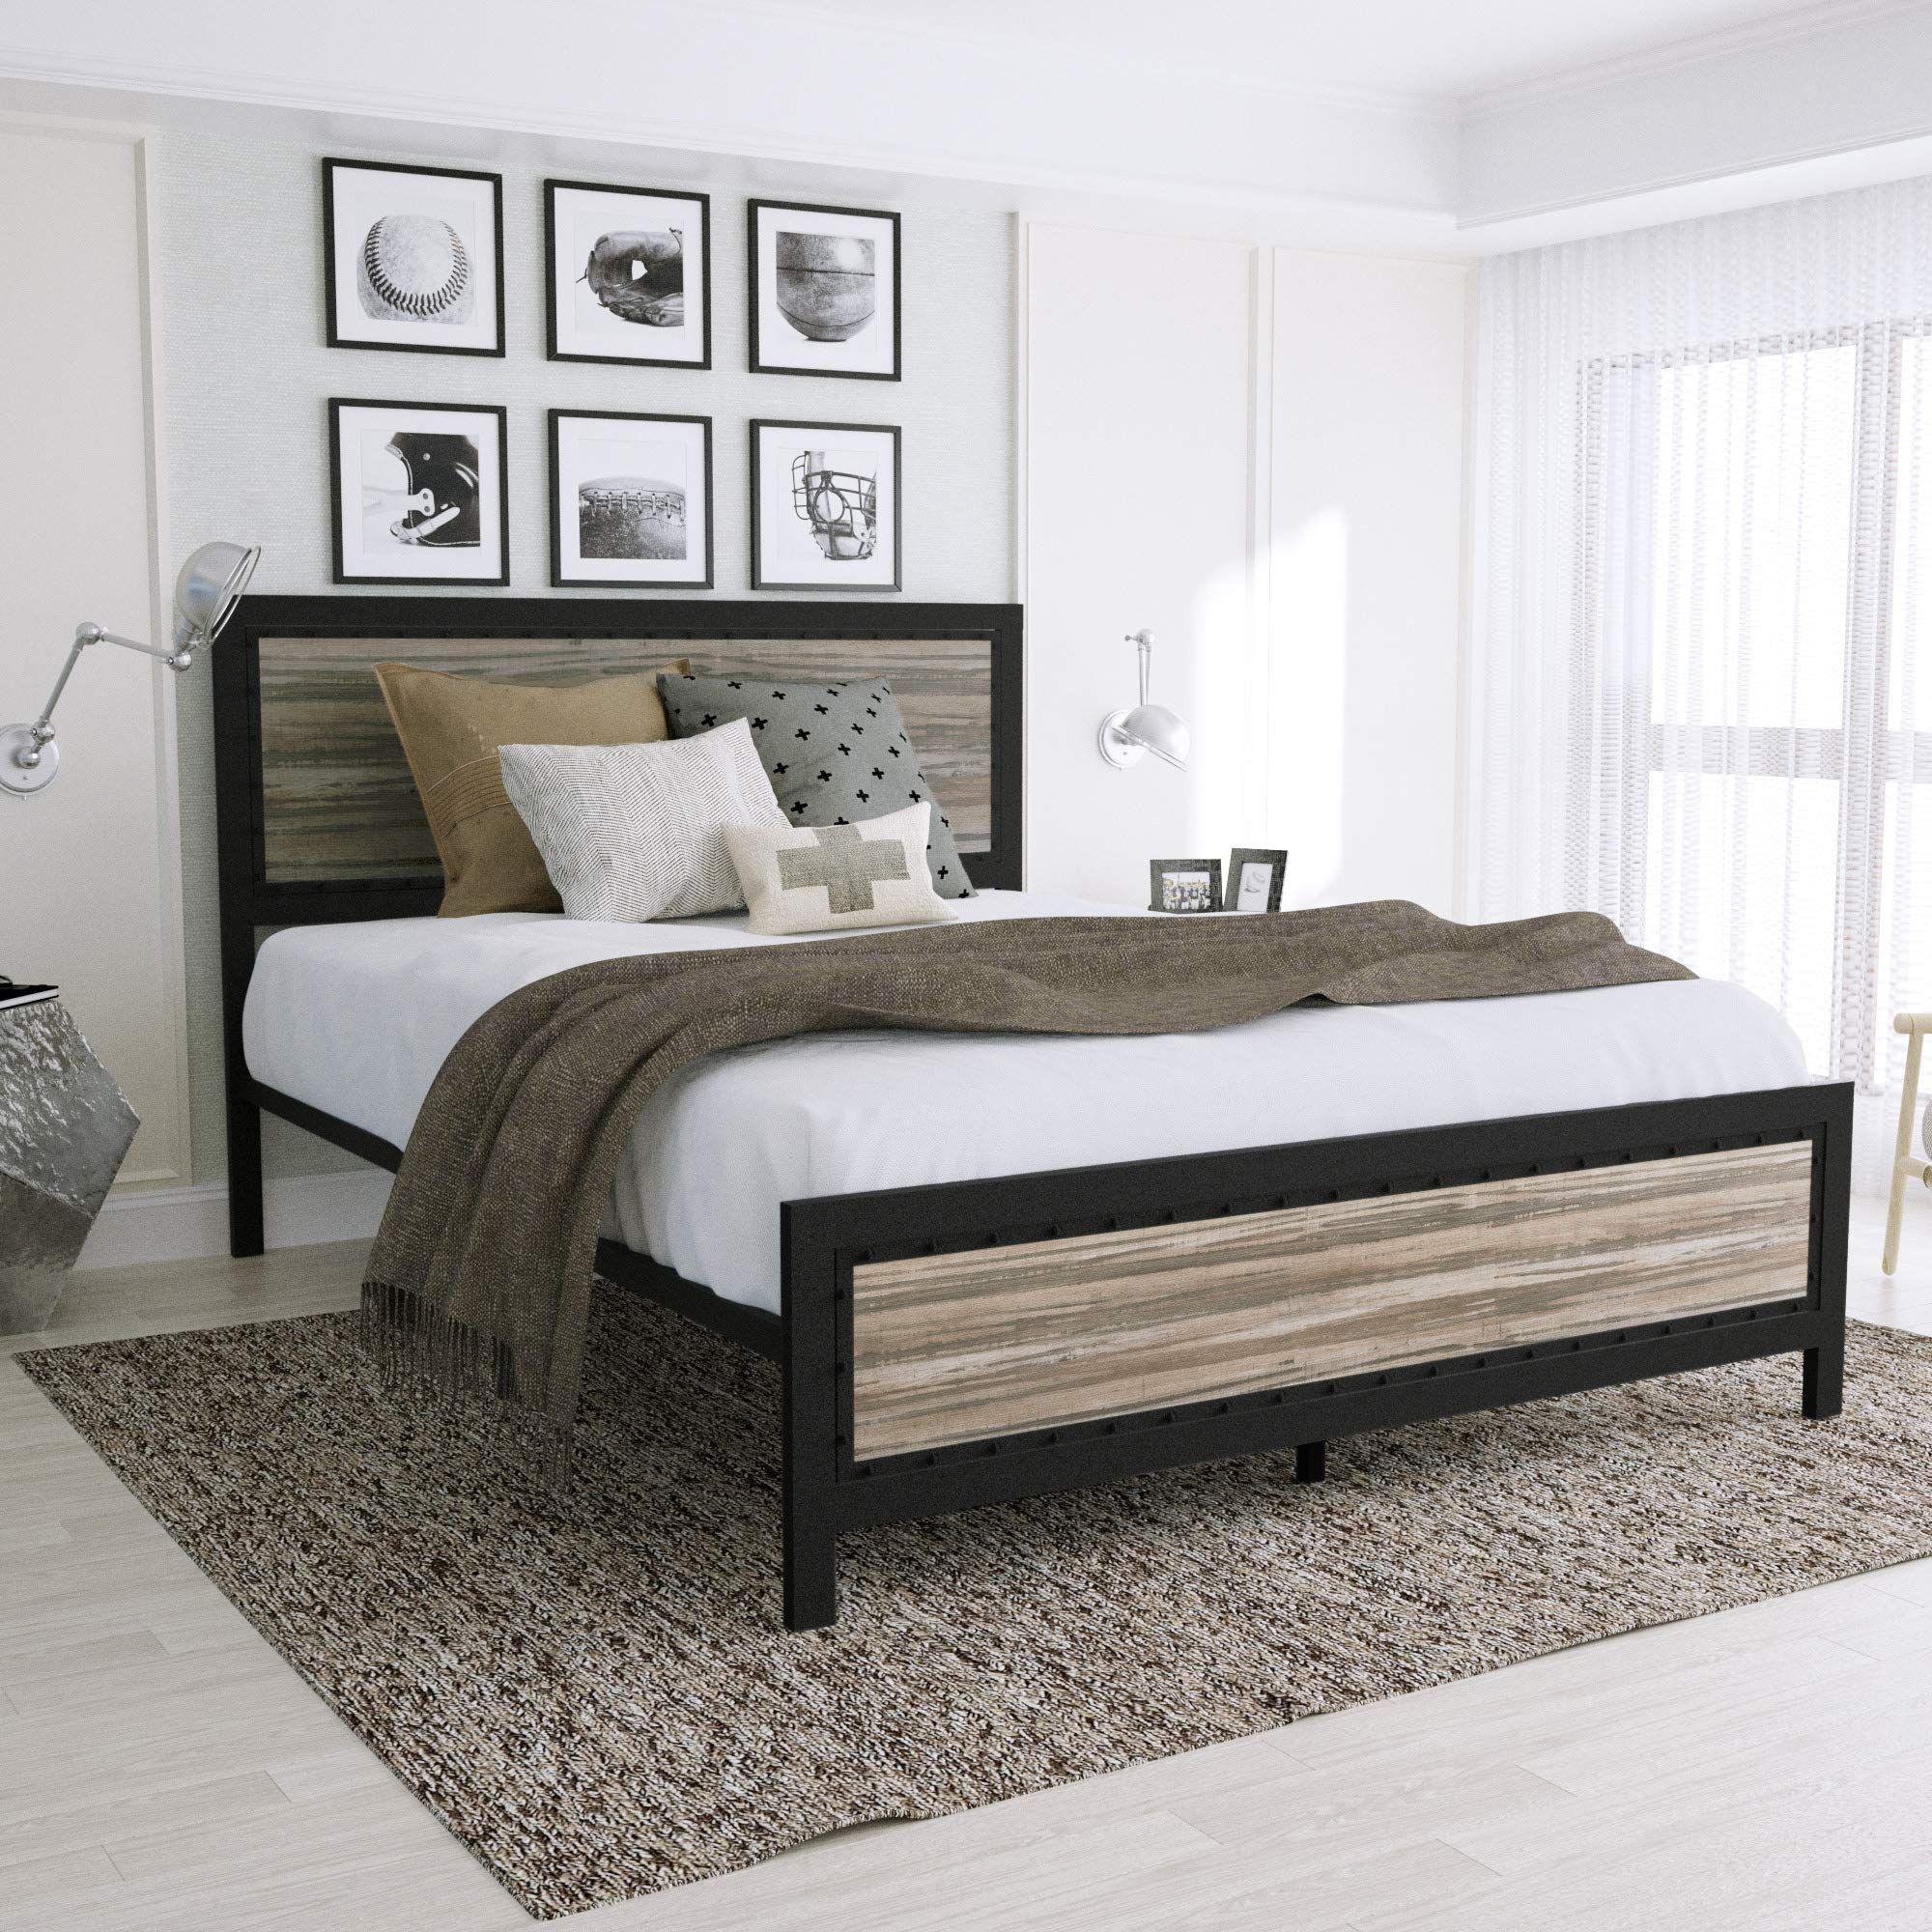 Urest Queen Size Bed Frame with Headboard/Platform Bed